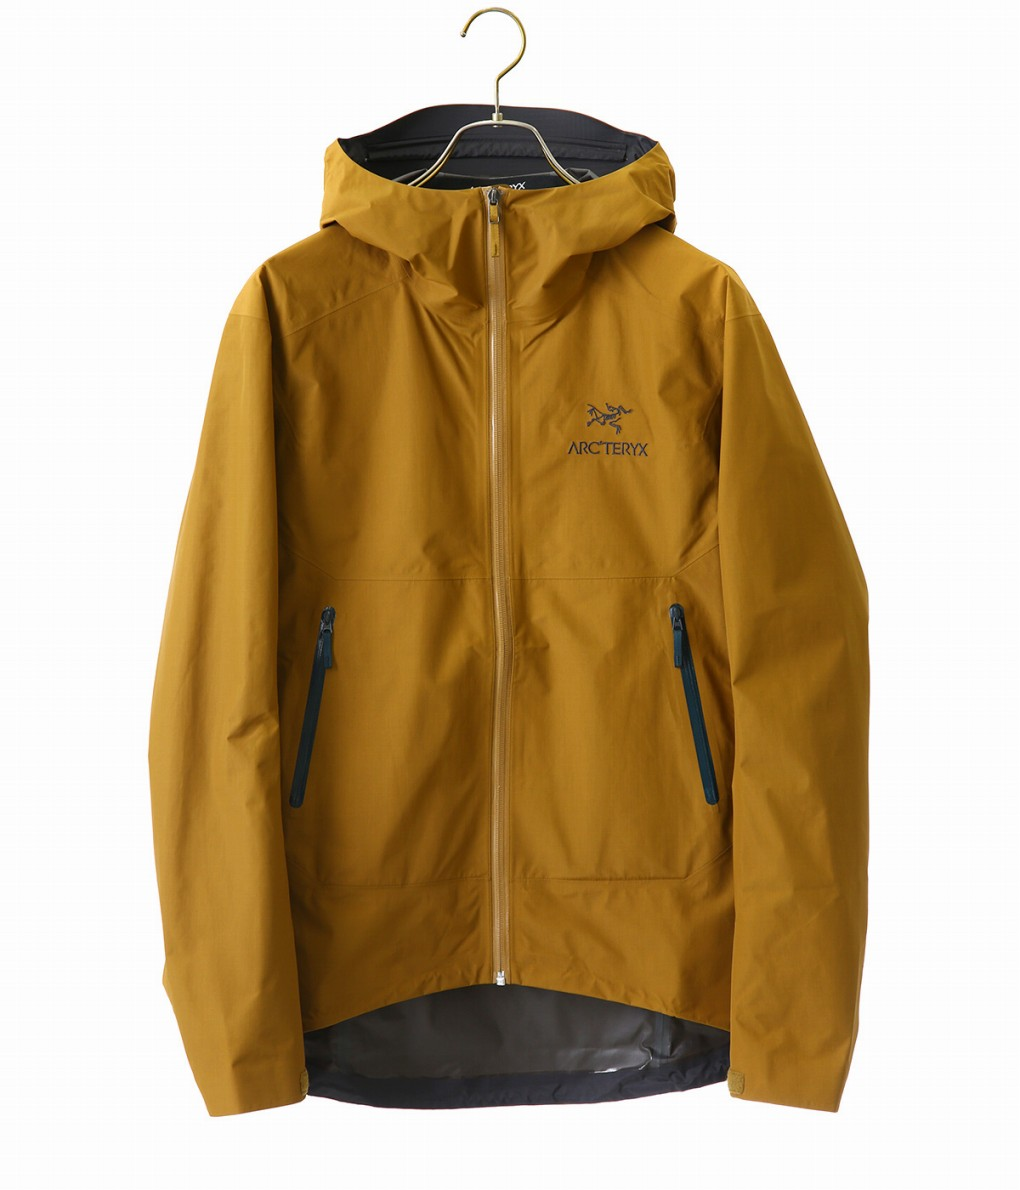 ARC'TERYX / アークテリクス : Zeta SL Jacket Men's : スポーツ アークテリクス ゼータ エスエル ジャケット メンズ : L07131900 【STD】【REA】